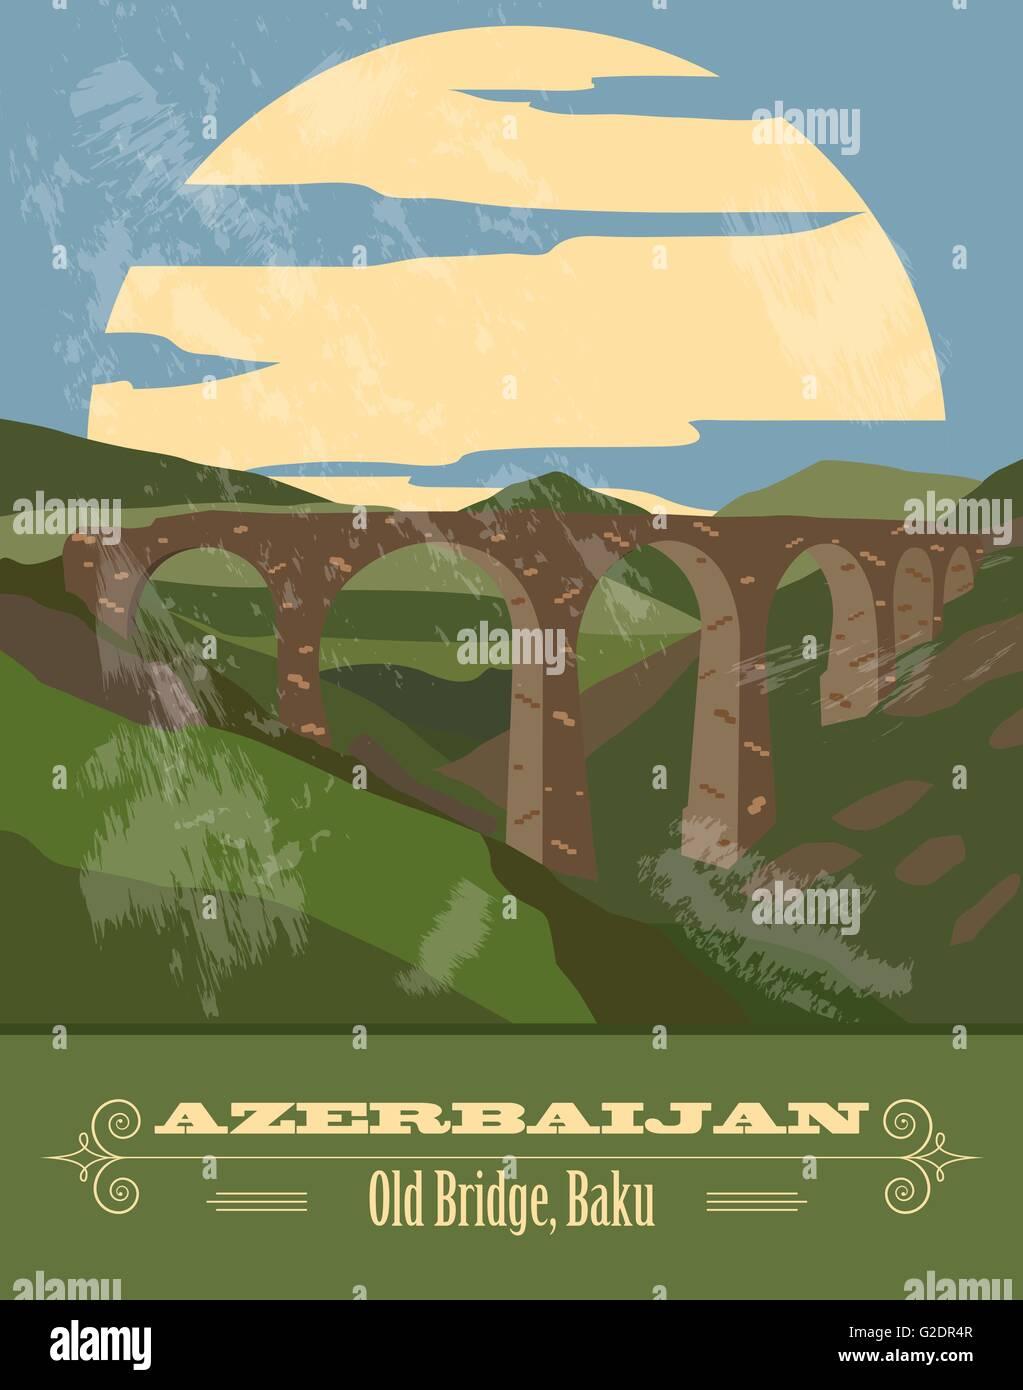 Azerbaijan landmarks. Retro styled image. Vector illustration - Stock Vector